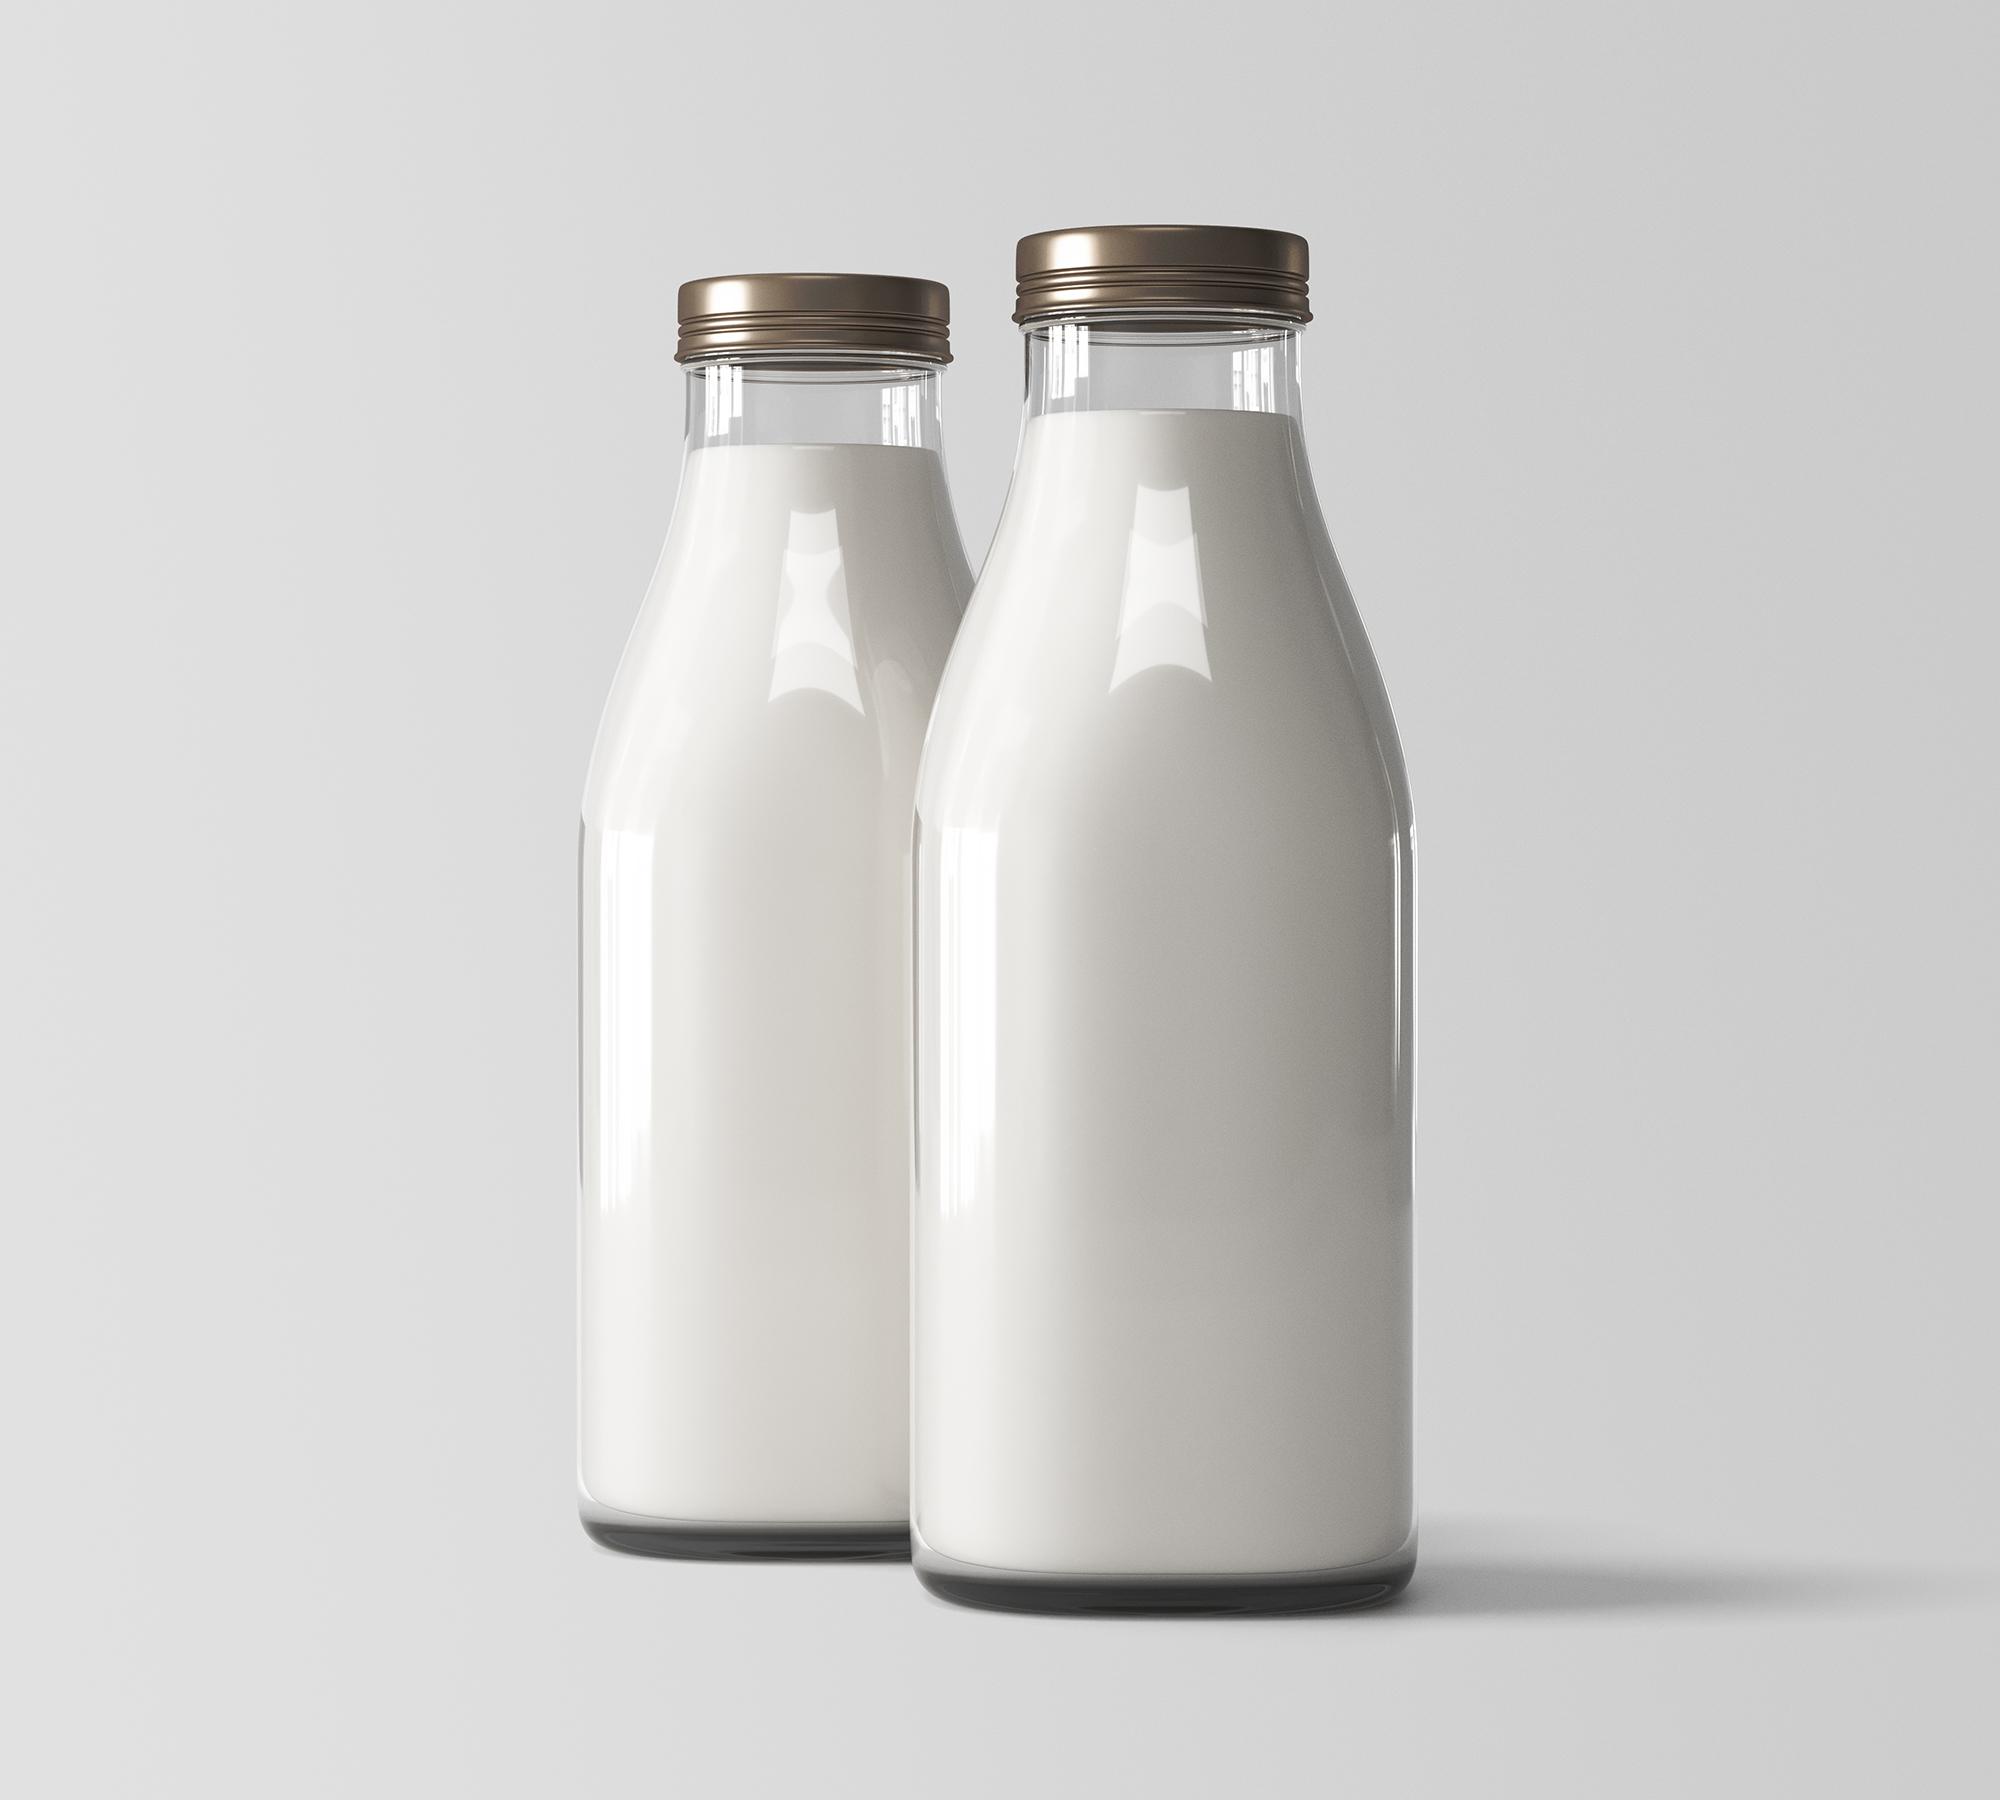 Two Milk Bottles Mockup 2